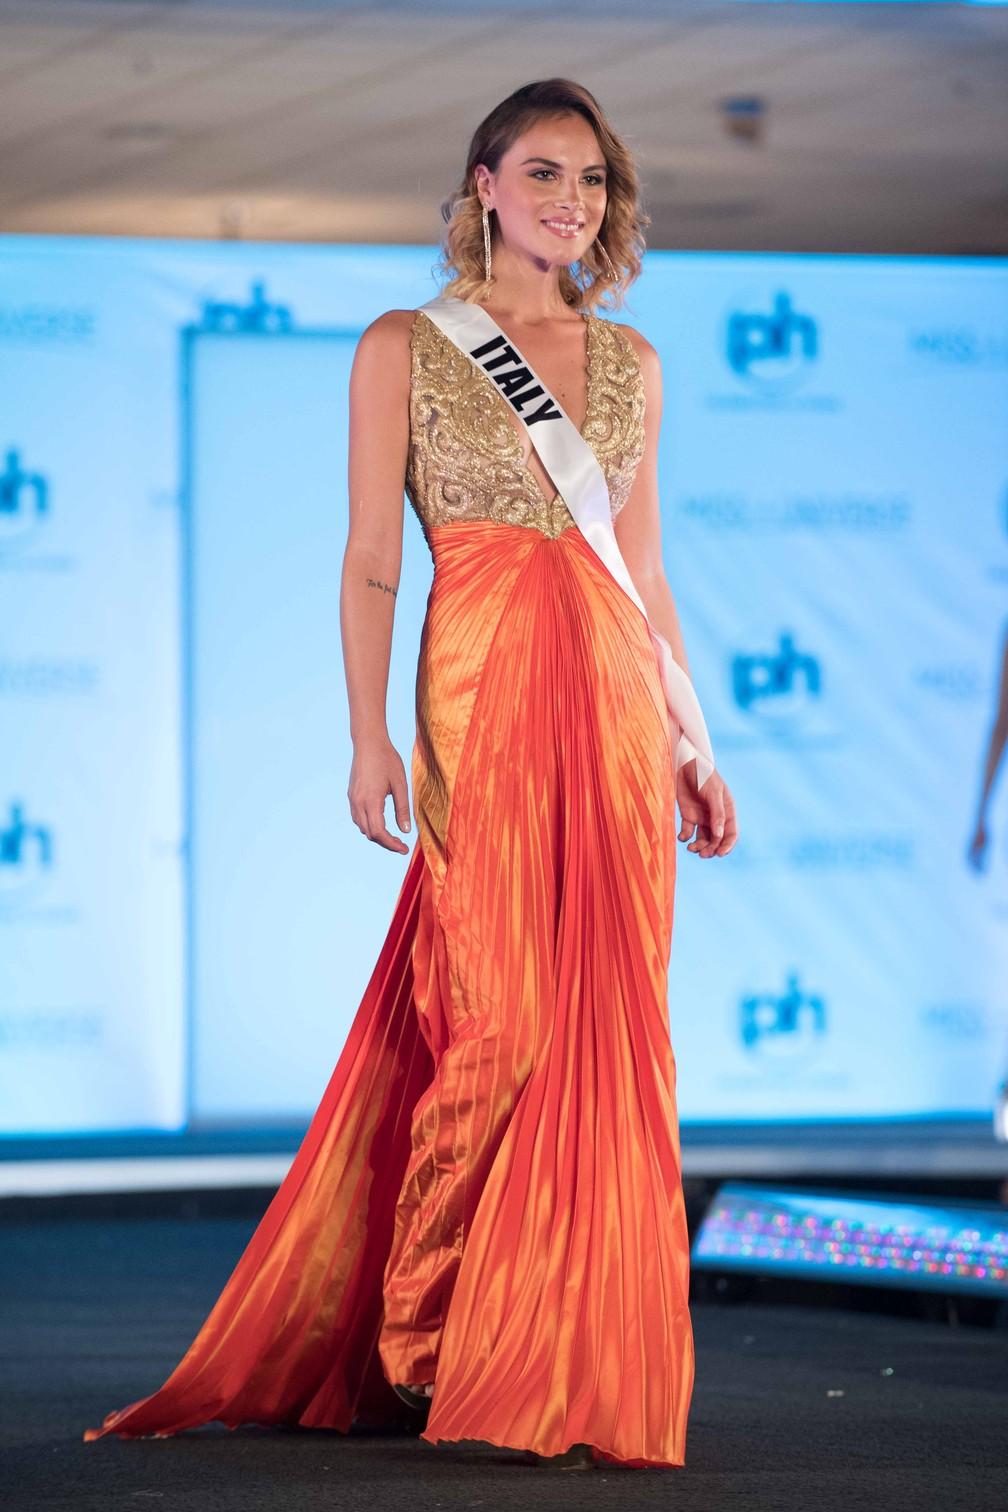 Maria Polverino, Miss Itália (Foto: Matt Petit/Miss Universe Organization/AFP)